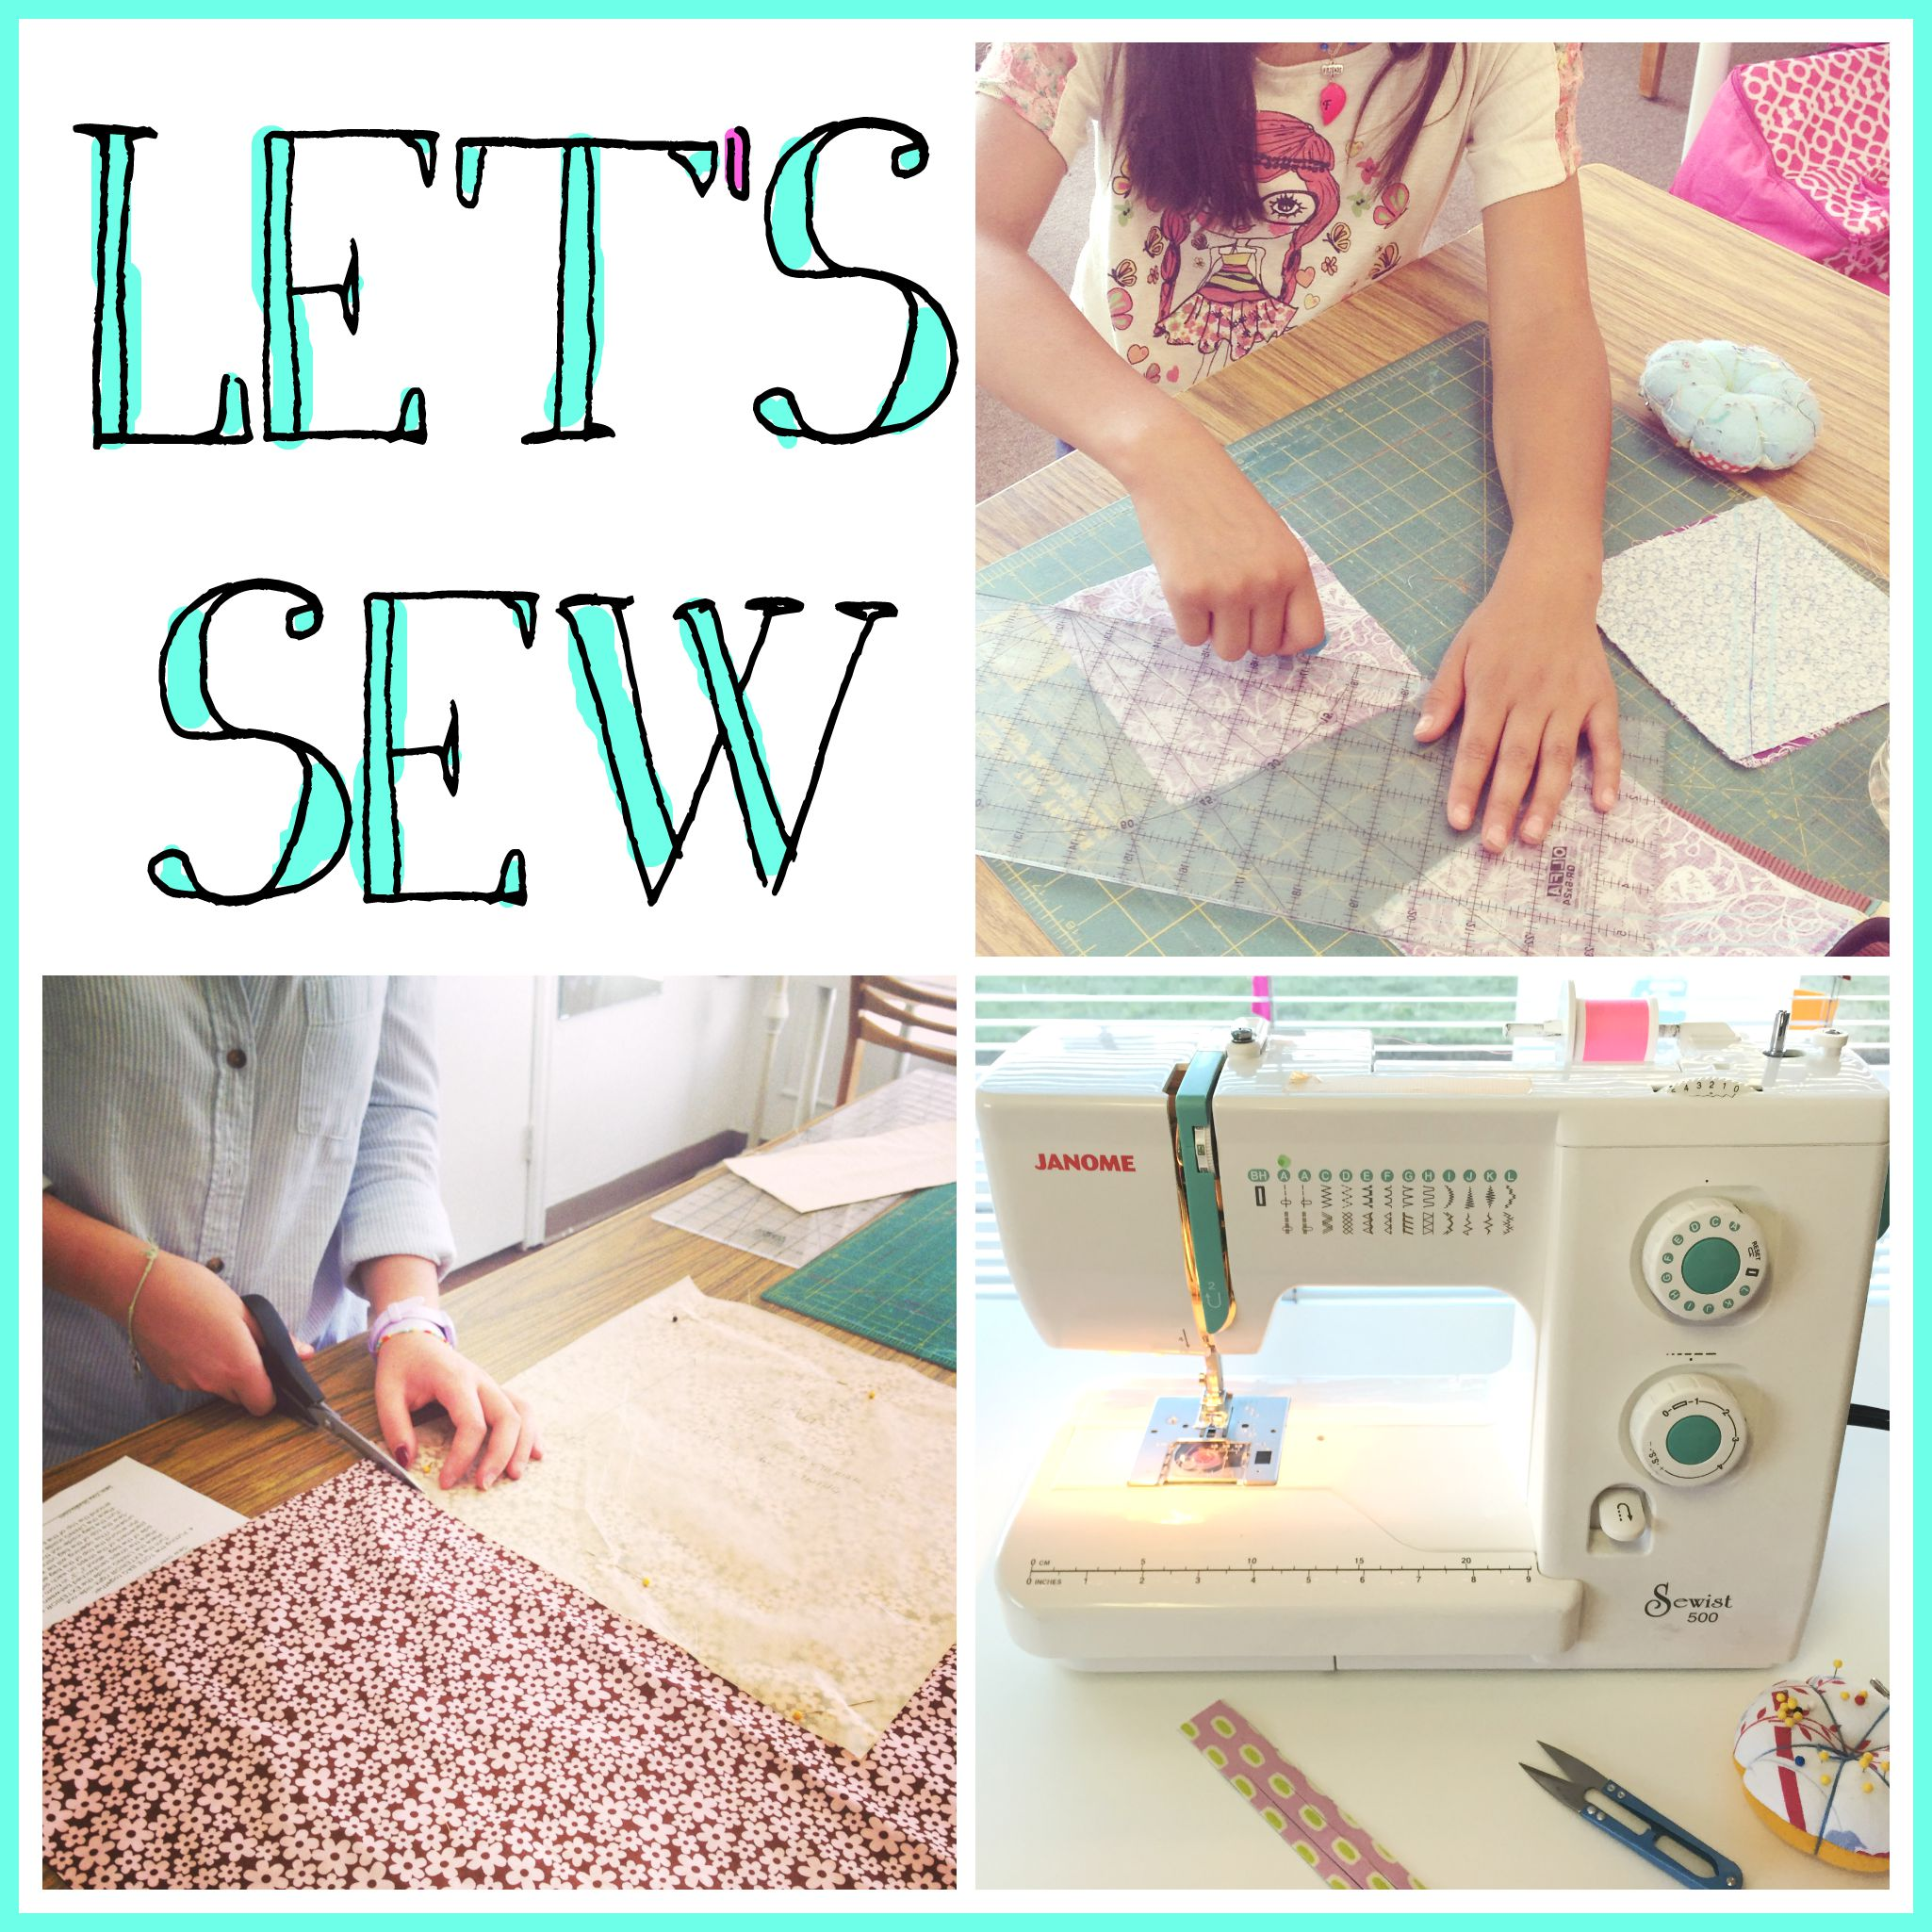 Let's Sew | Sew You Studio.com